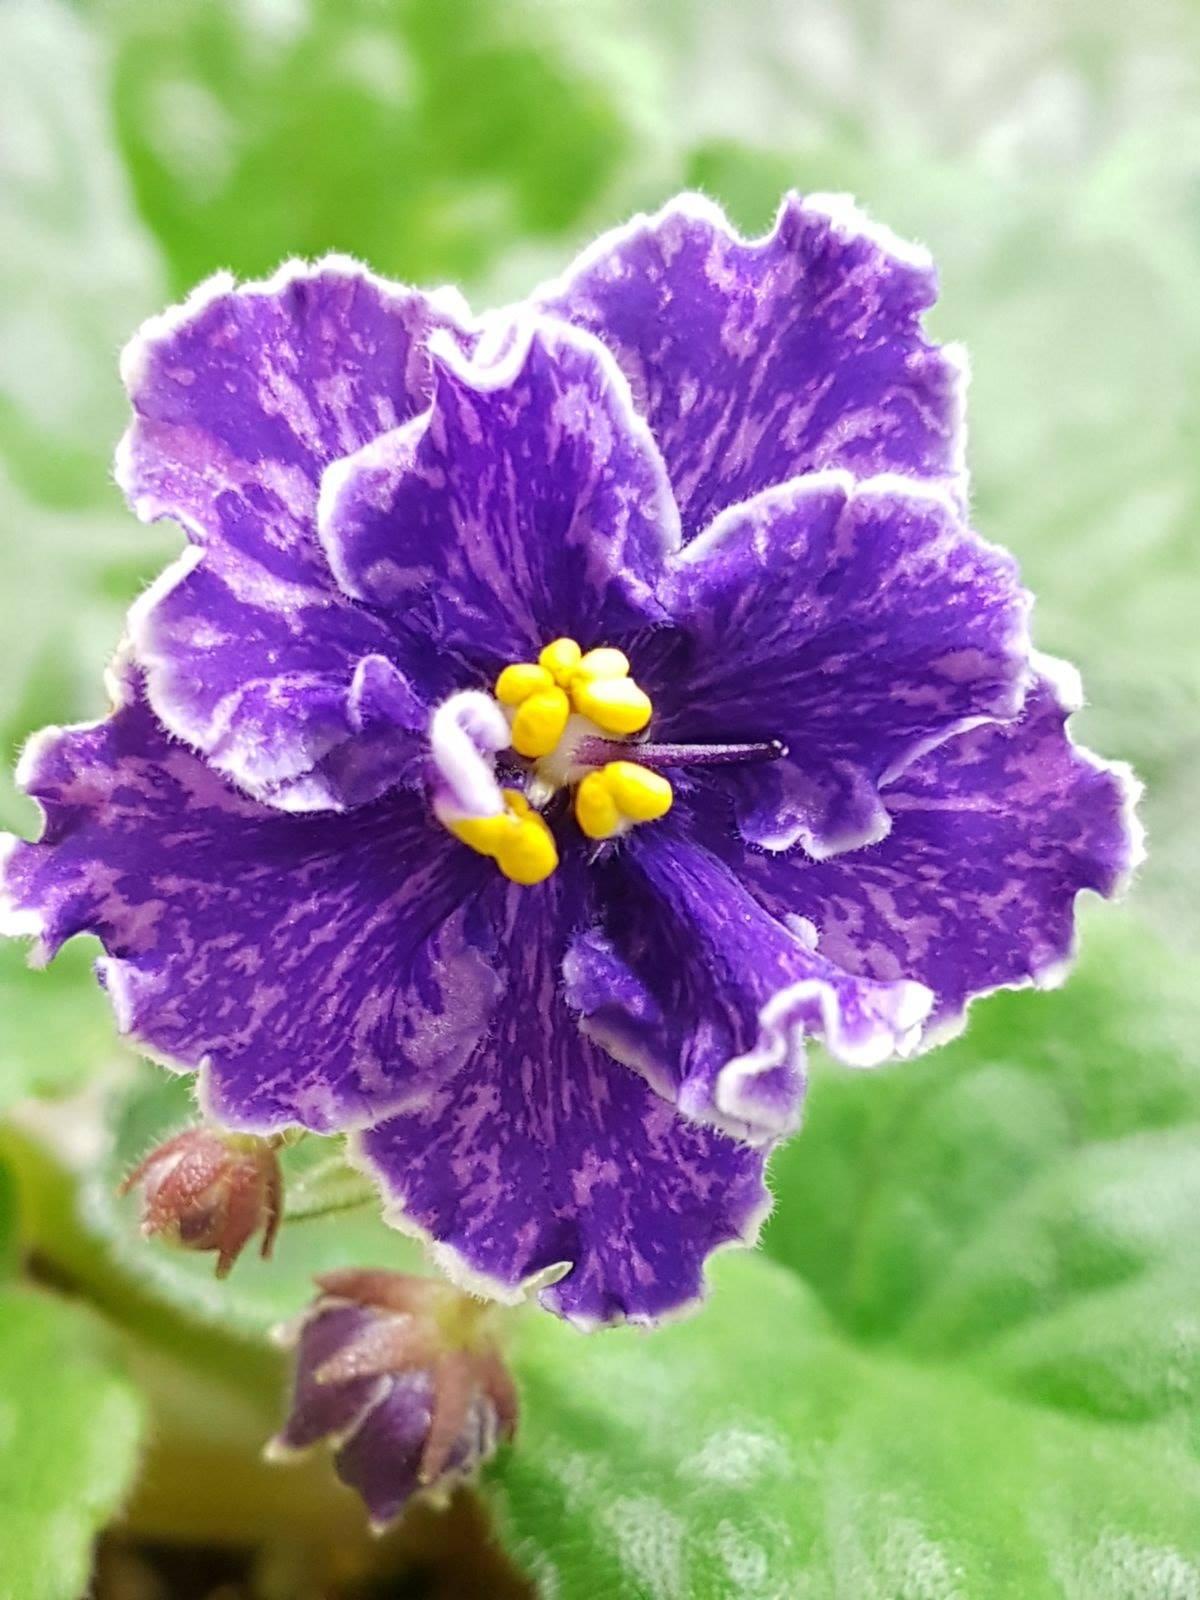 非洲紫羅蘭名錄 | African Violets Catalogue - B系列 B35